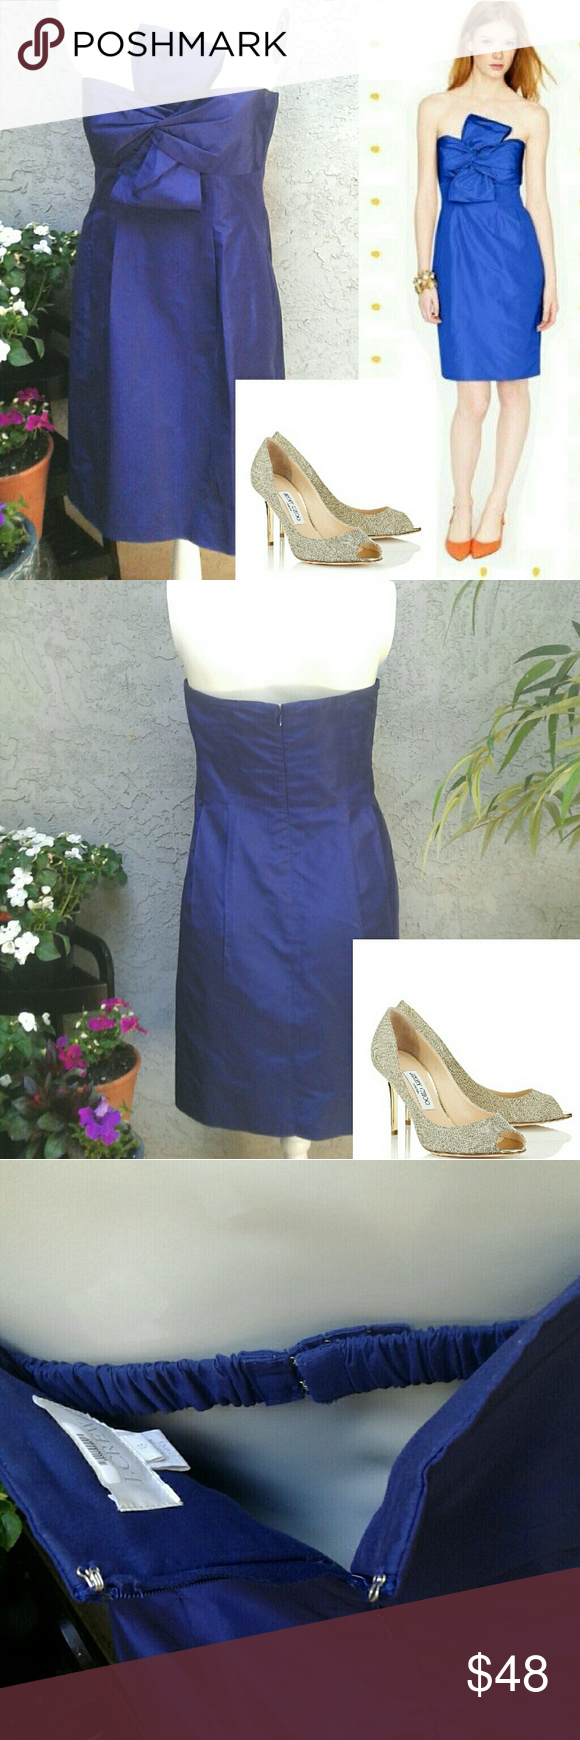 Jcrew bow monde navy silk taffeta dress sz perfect bridesmaid